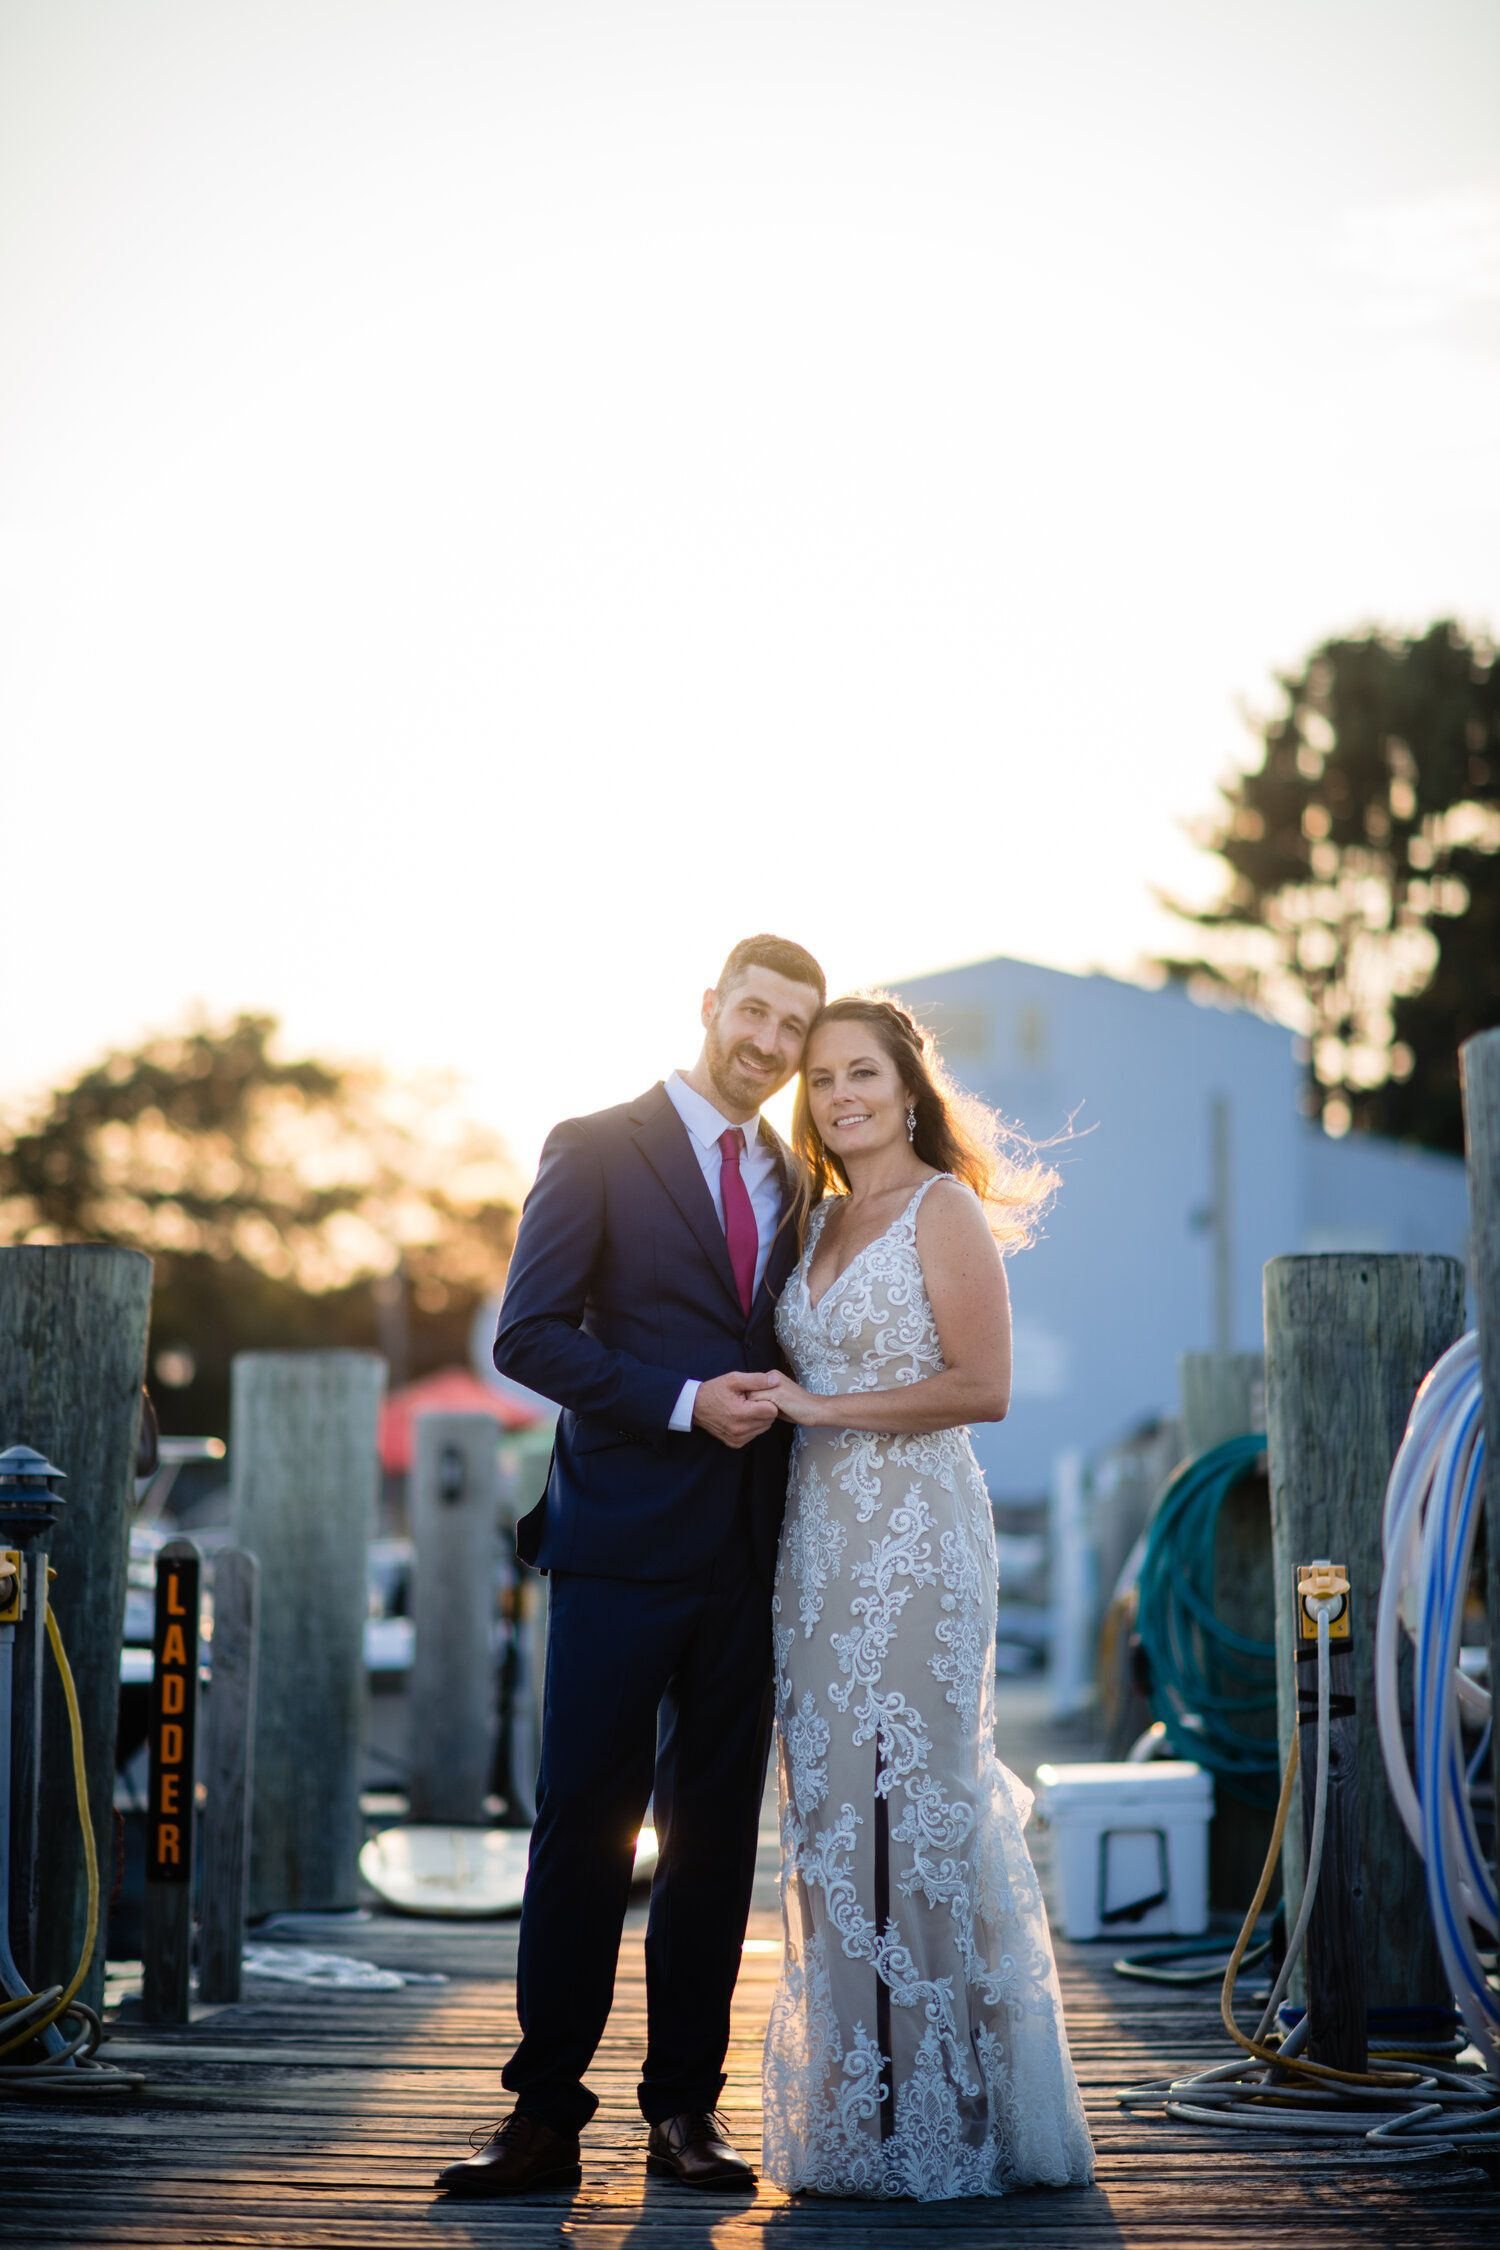 Christina Ryan S Summer Wedding In Mystic My Mystic Wedding In 2020 Summer Wedding Bridal Party Getting Ready Wedding